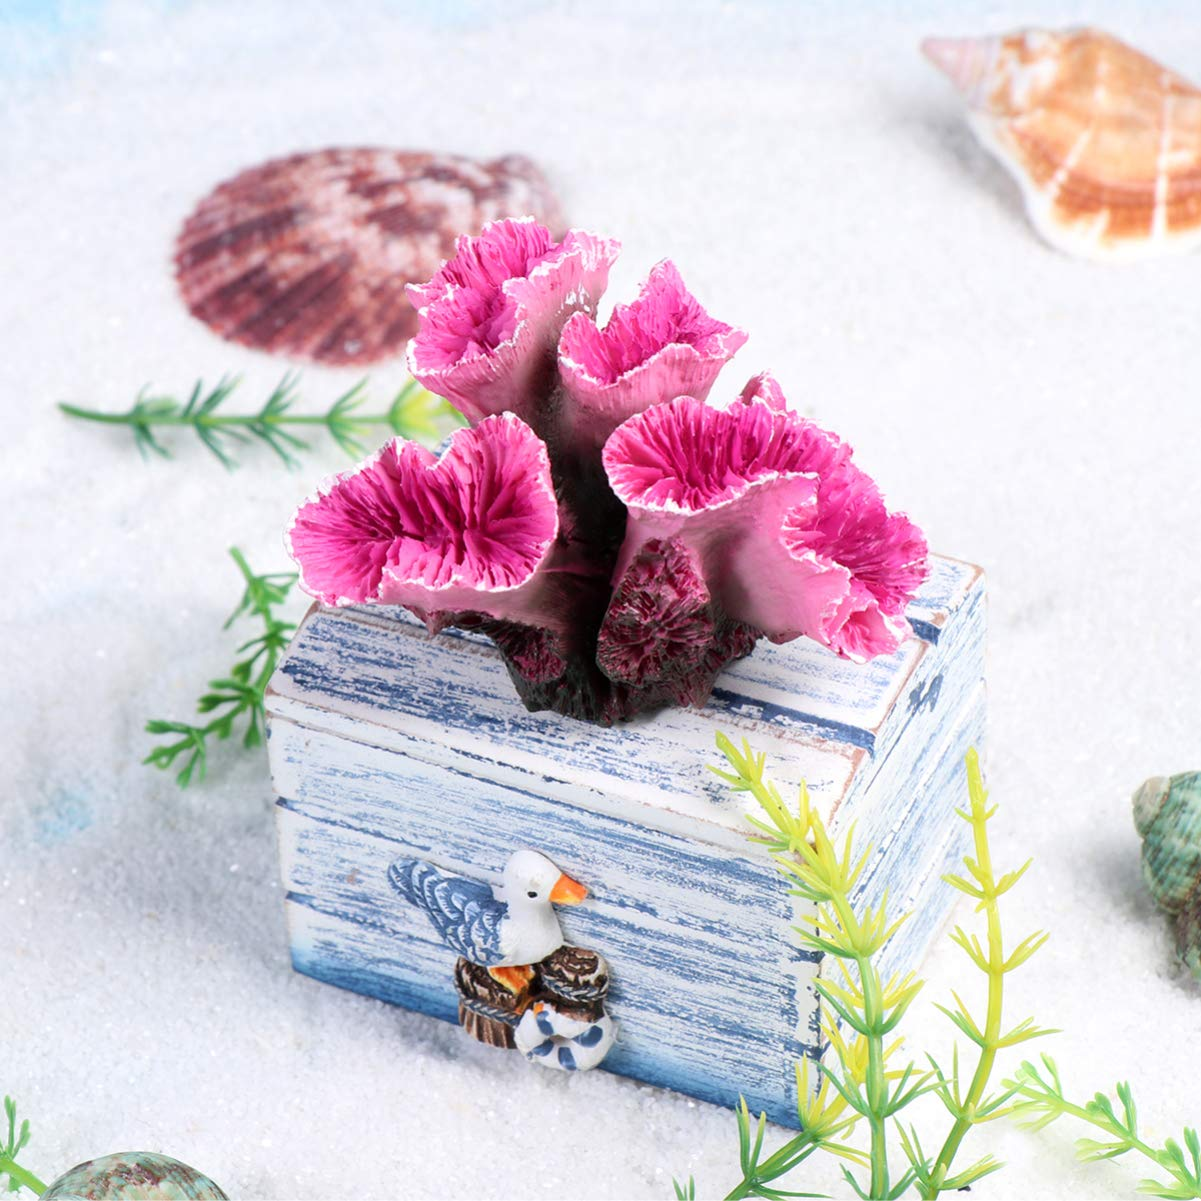 POPETPOP Decoraci/ón Artificial Acuario Coral Falsa Arrecife Submarino Decoraci/ón para Pecera Decoraci/ón del Paisaje